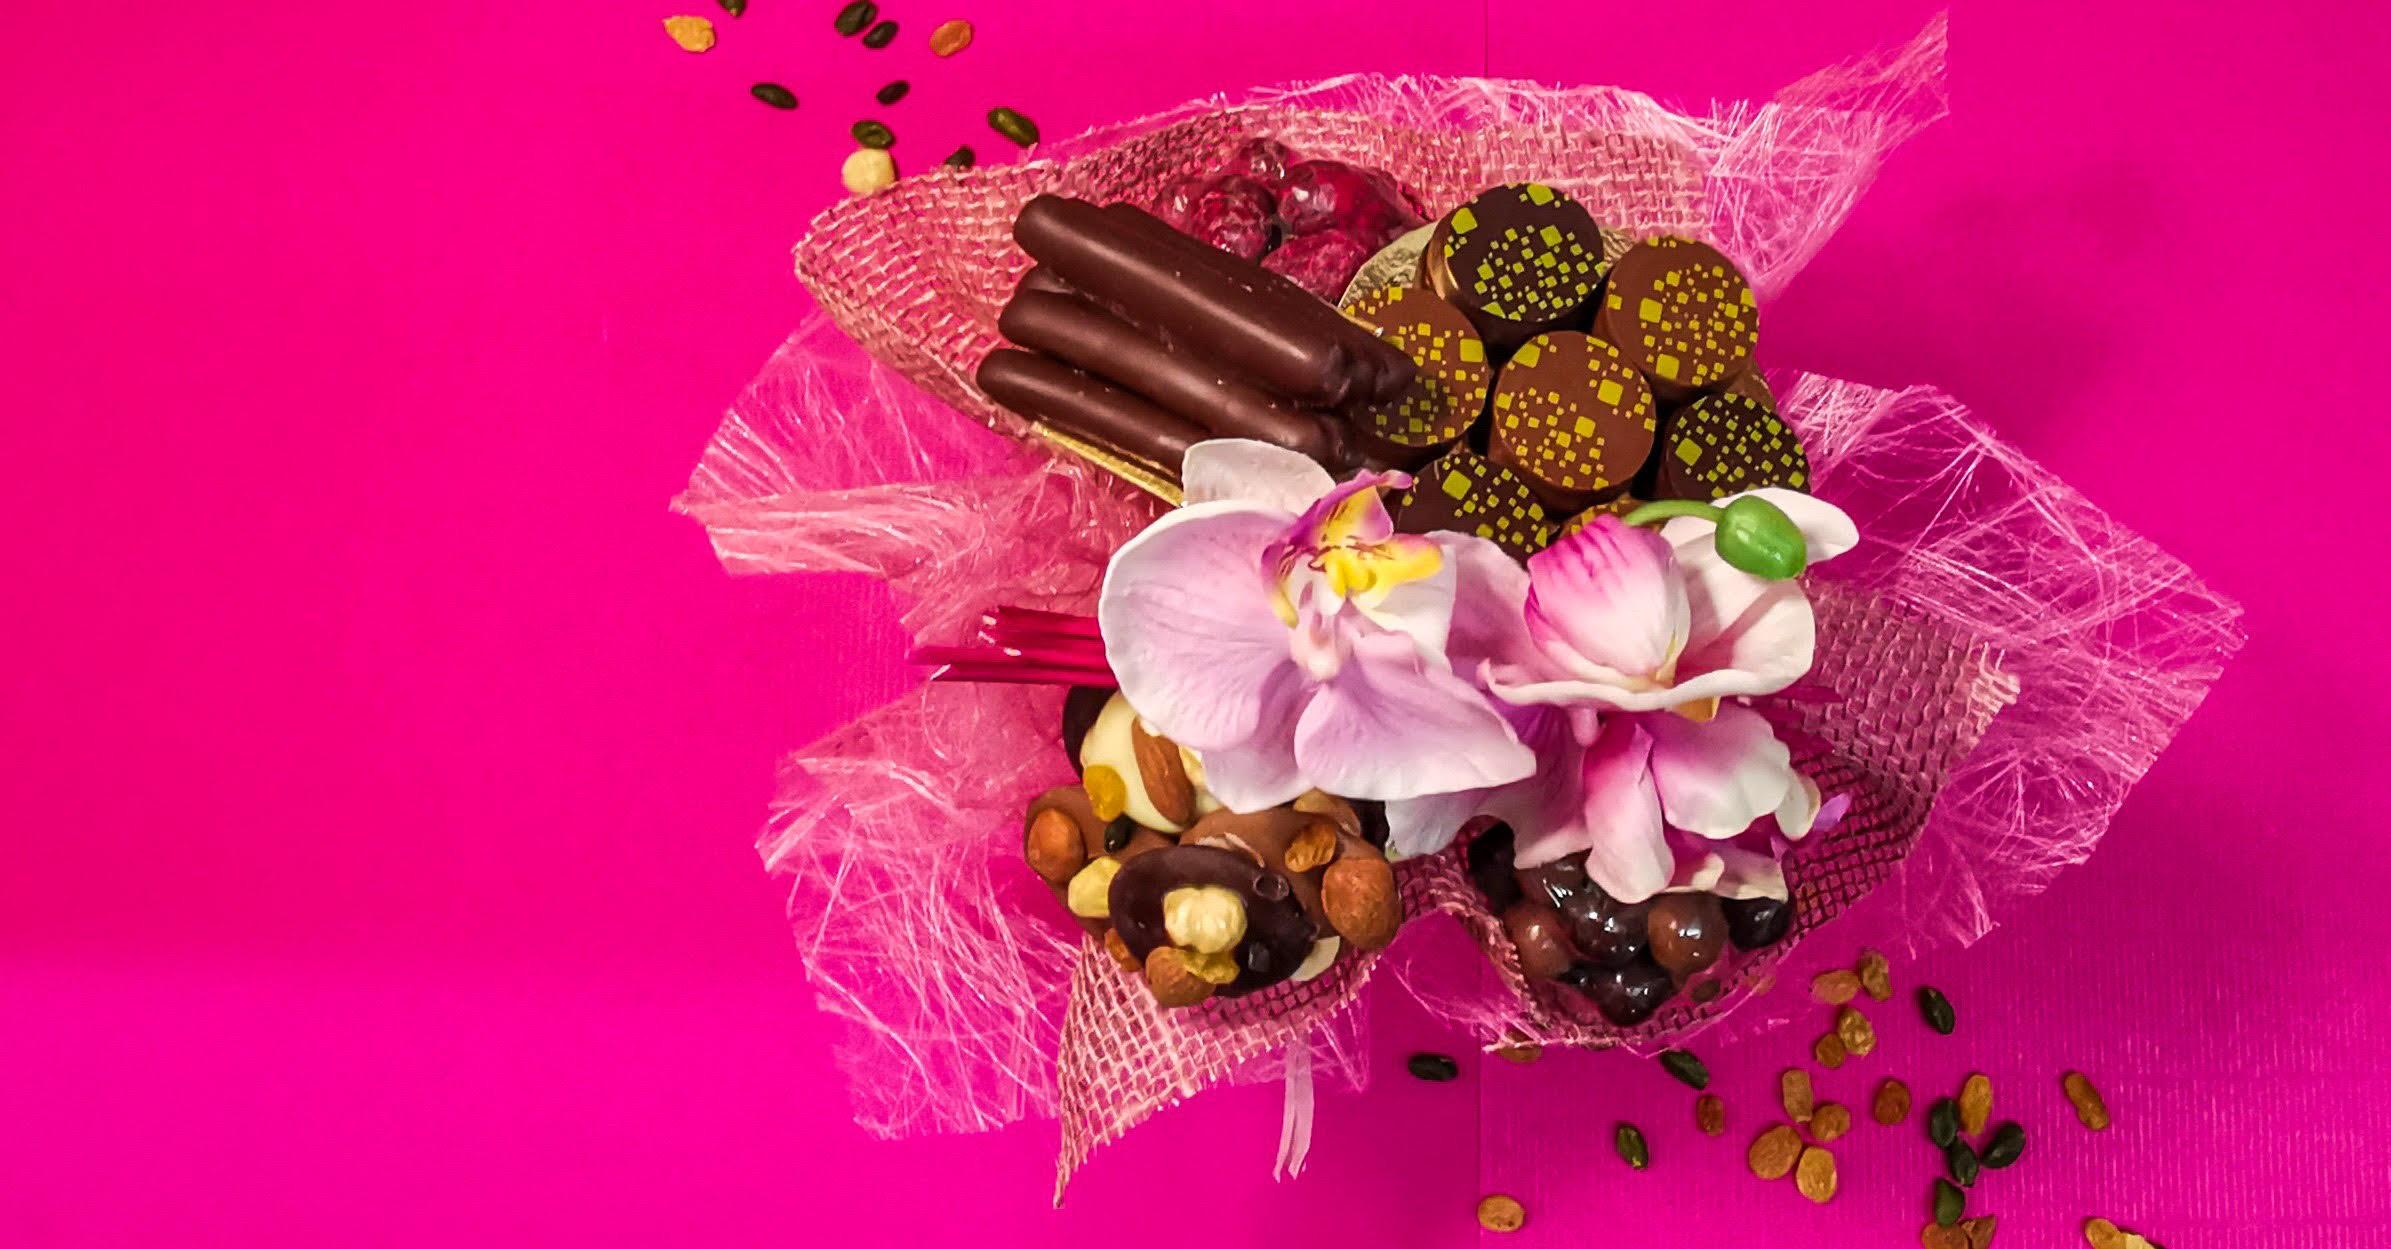 Flamboyant, une création gourmande chocolatée